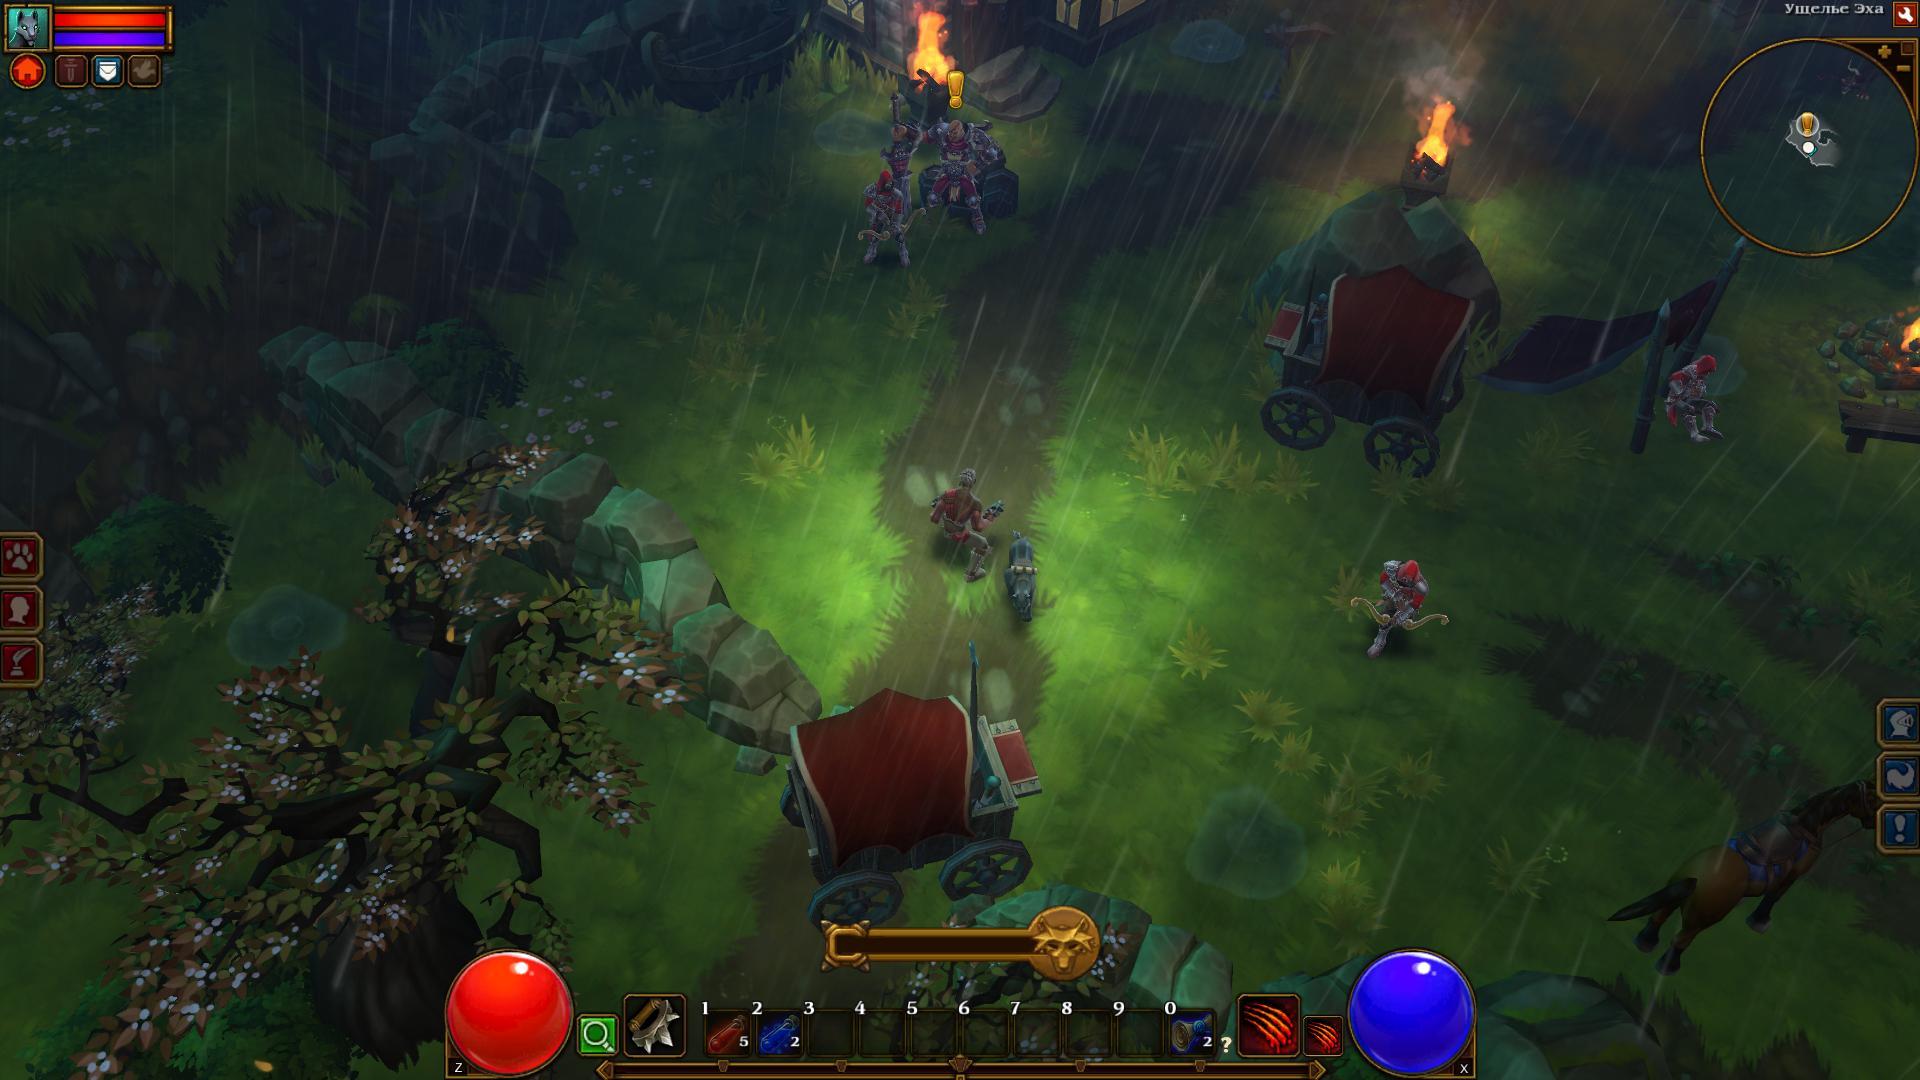 Скриншот Torchlight 2 [v.1.25.9.5] (2012) PC